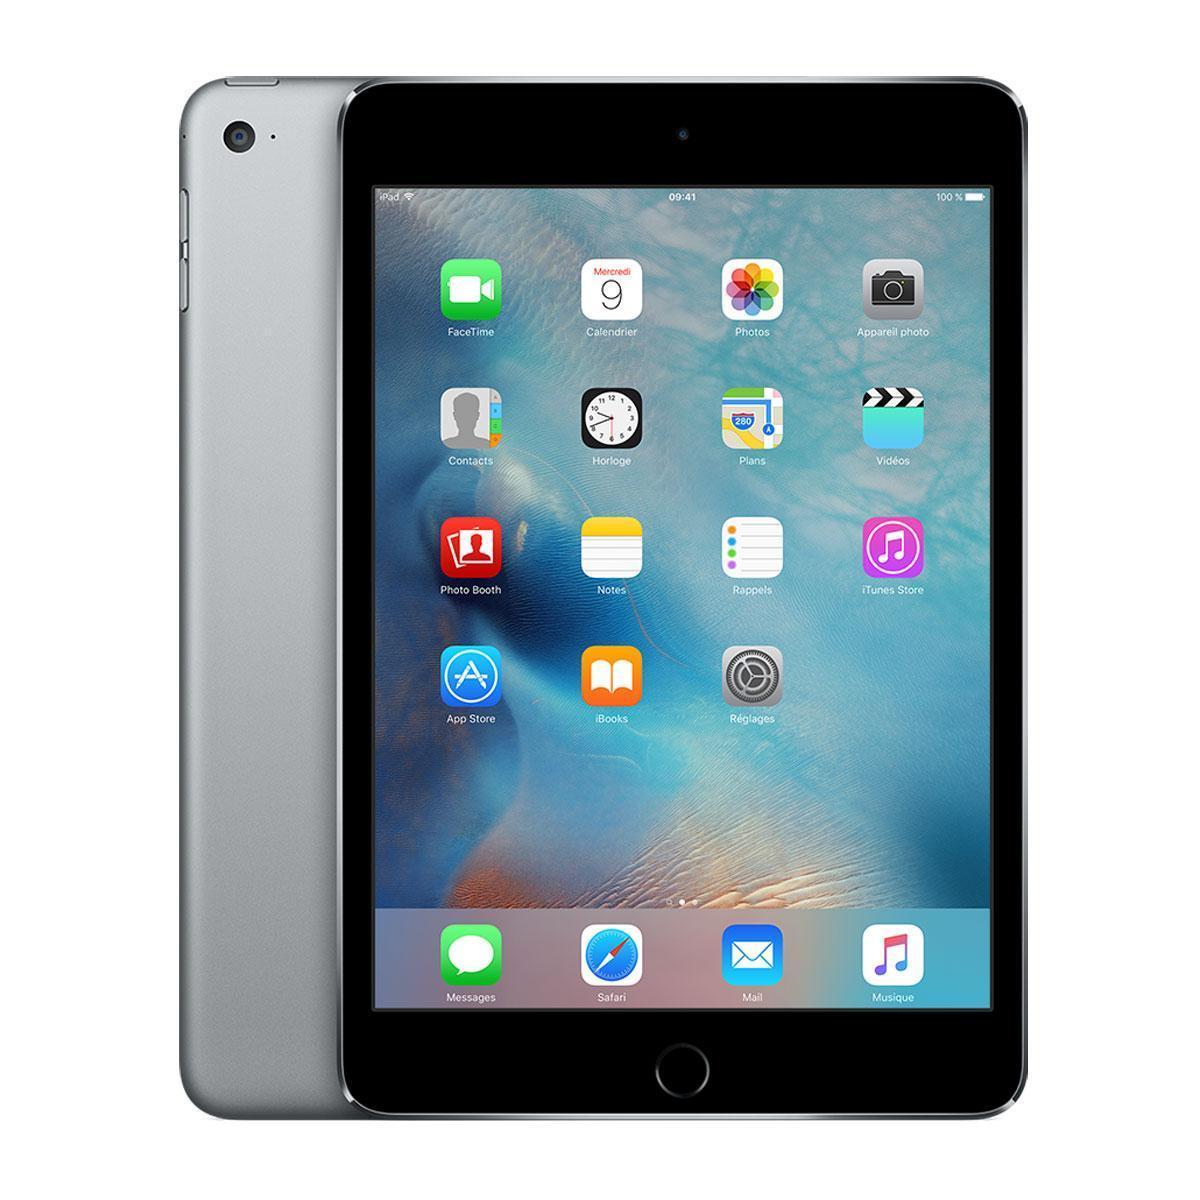 iPad mini 4 16GB - LTE + WLAN - Spacegrau - Ohne Vertrag